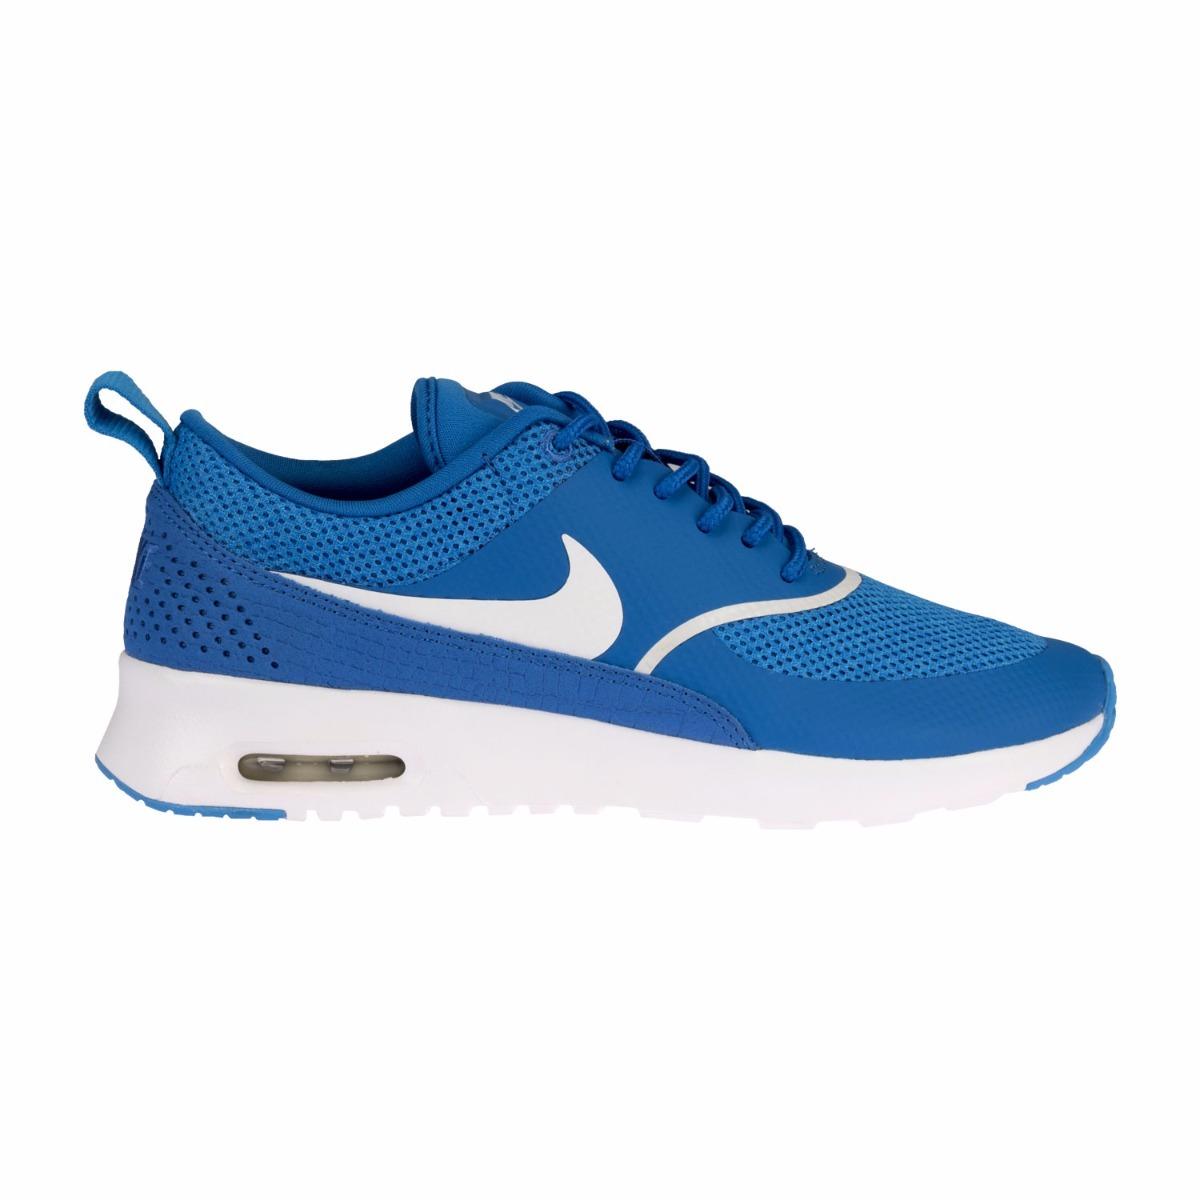 Passarela zapatilla Nike 599409 413 (5* 8*) Air Max Thea